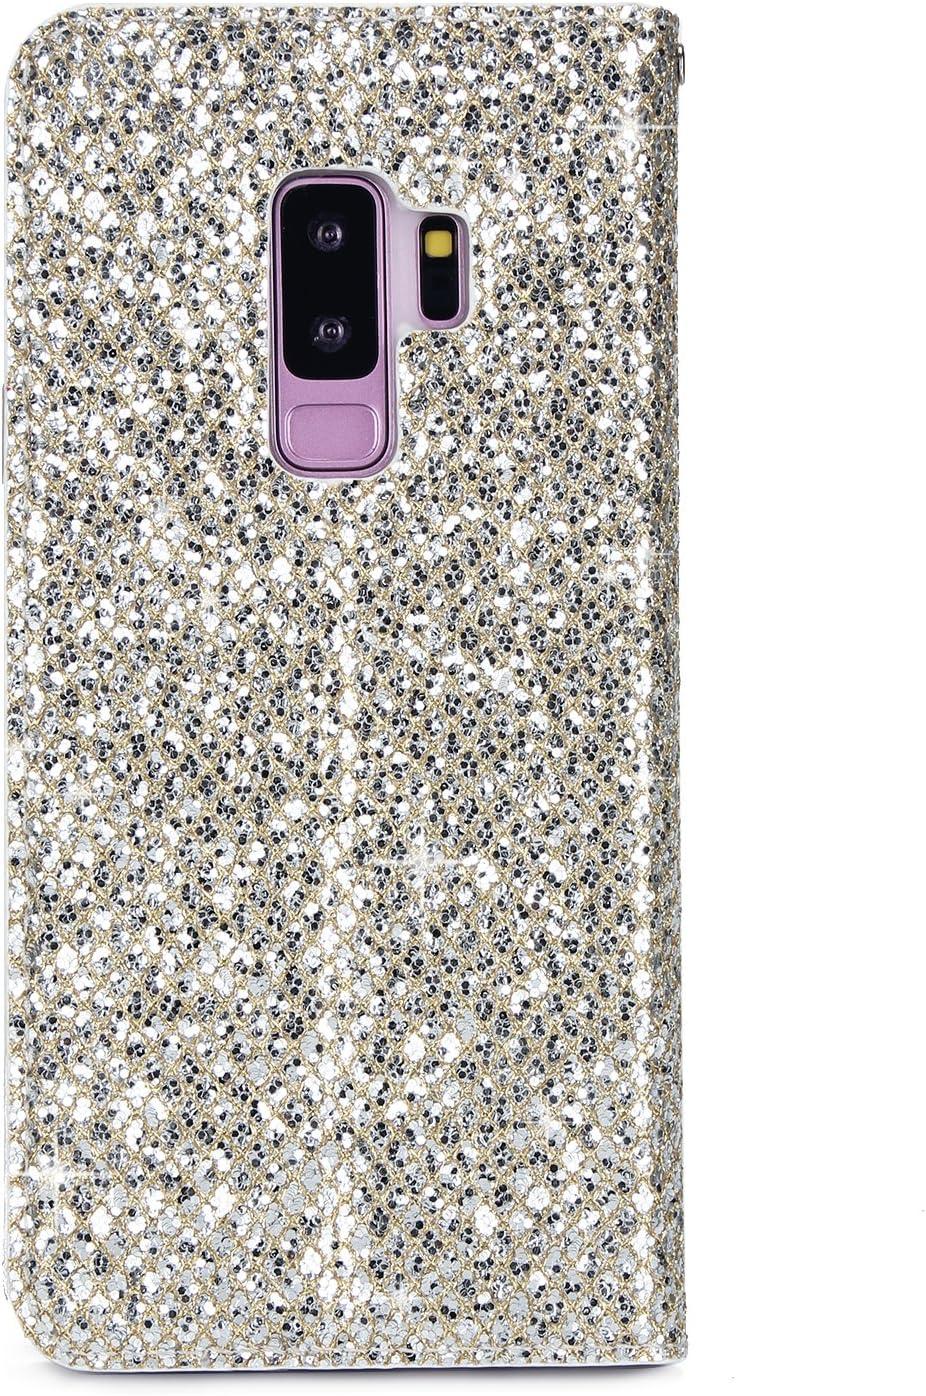 Karomenic PU Leder H/ülle kompatibel mit Samsung Galaxy S9 Plus Bling Gl/änzend Glitzer Handyh/ülle Brieftasche TPU Silikon Schutzh/ülle Klapph/ülle Ledertasche St/änder Wallet Flip Case Etui,Rose rot